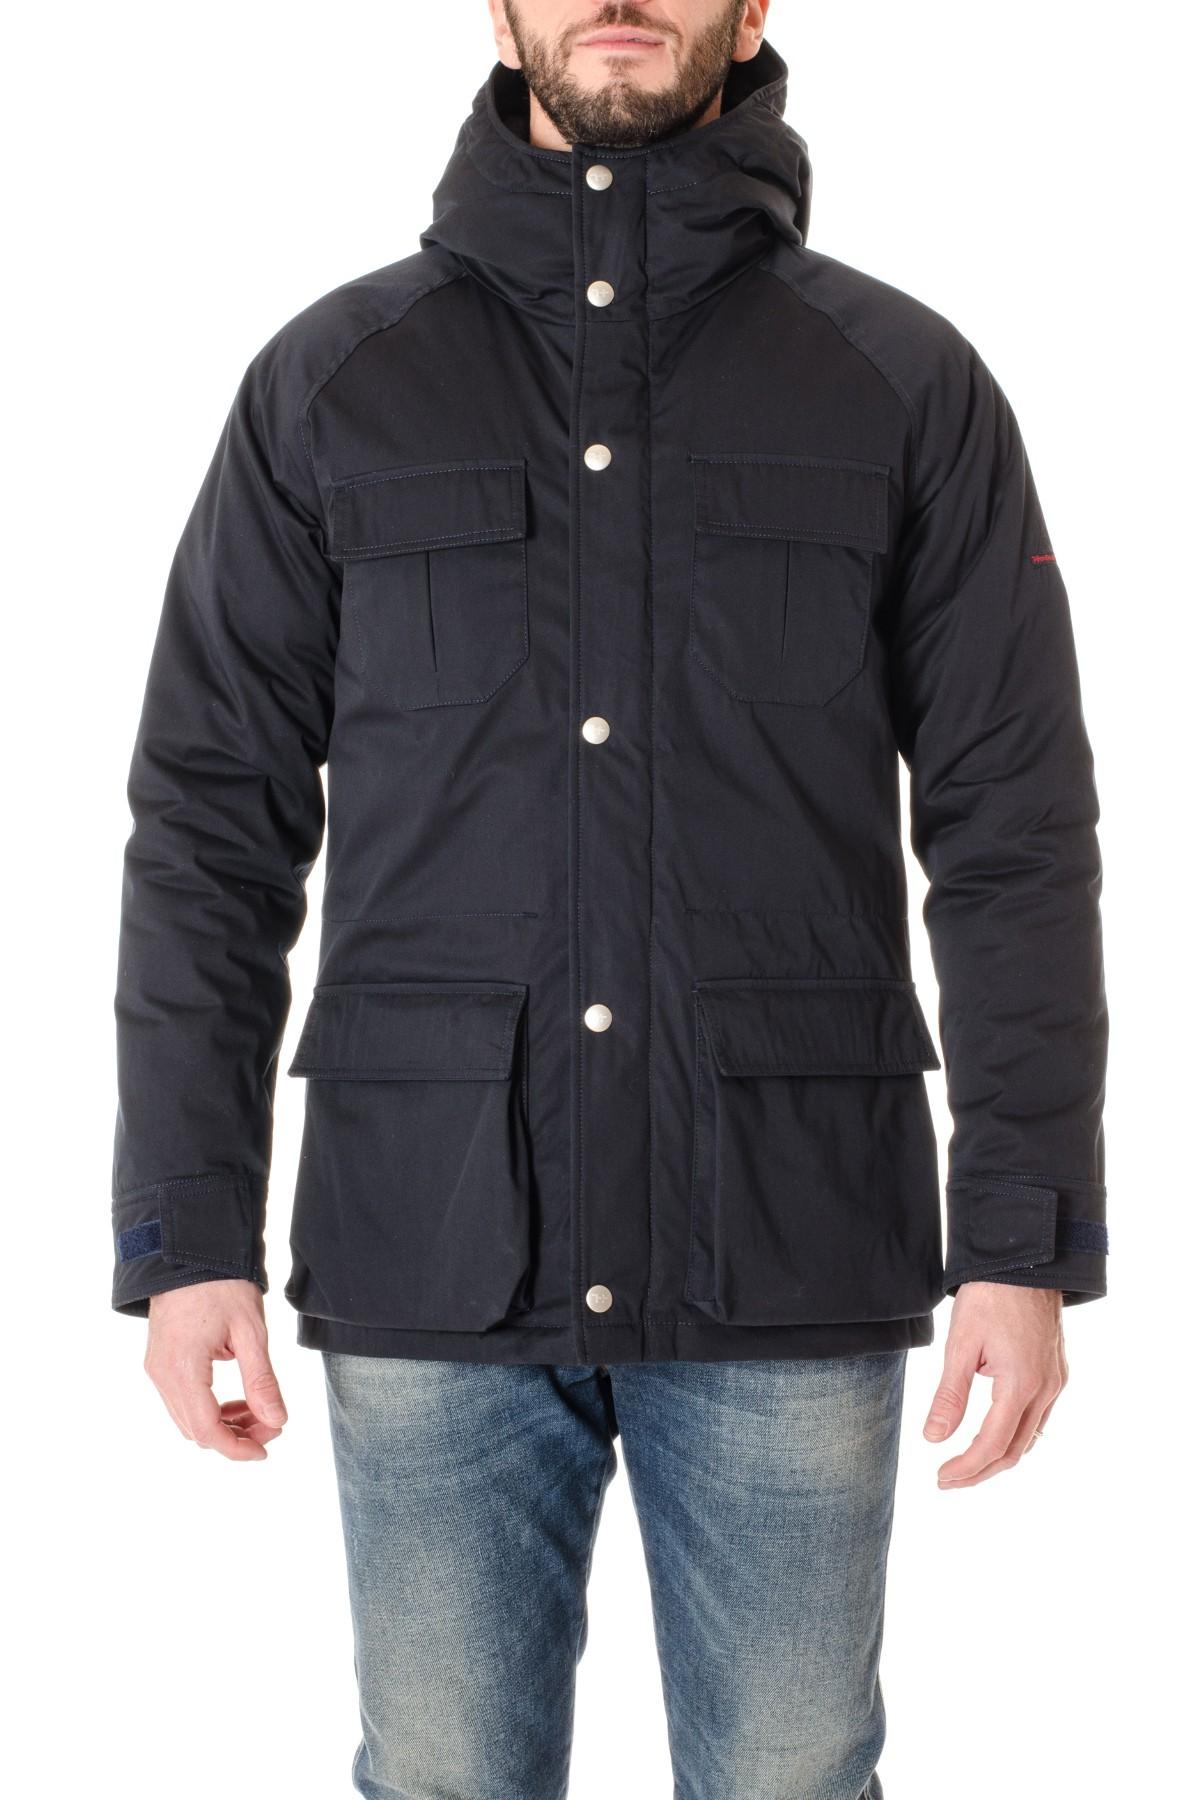 54bada2952b41 Blue padded jacket HOLUBAR F/W 16-17 DEER HUNTER - Rione Fontana